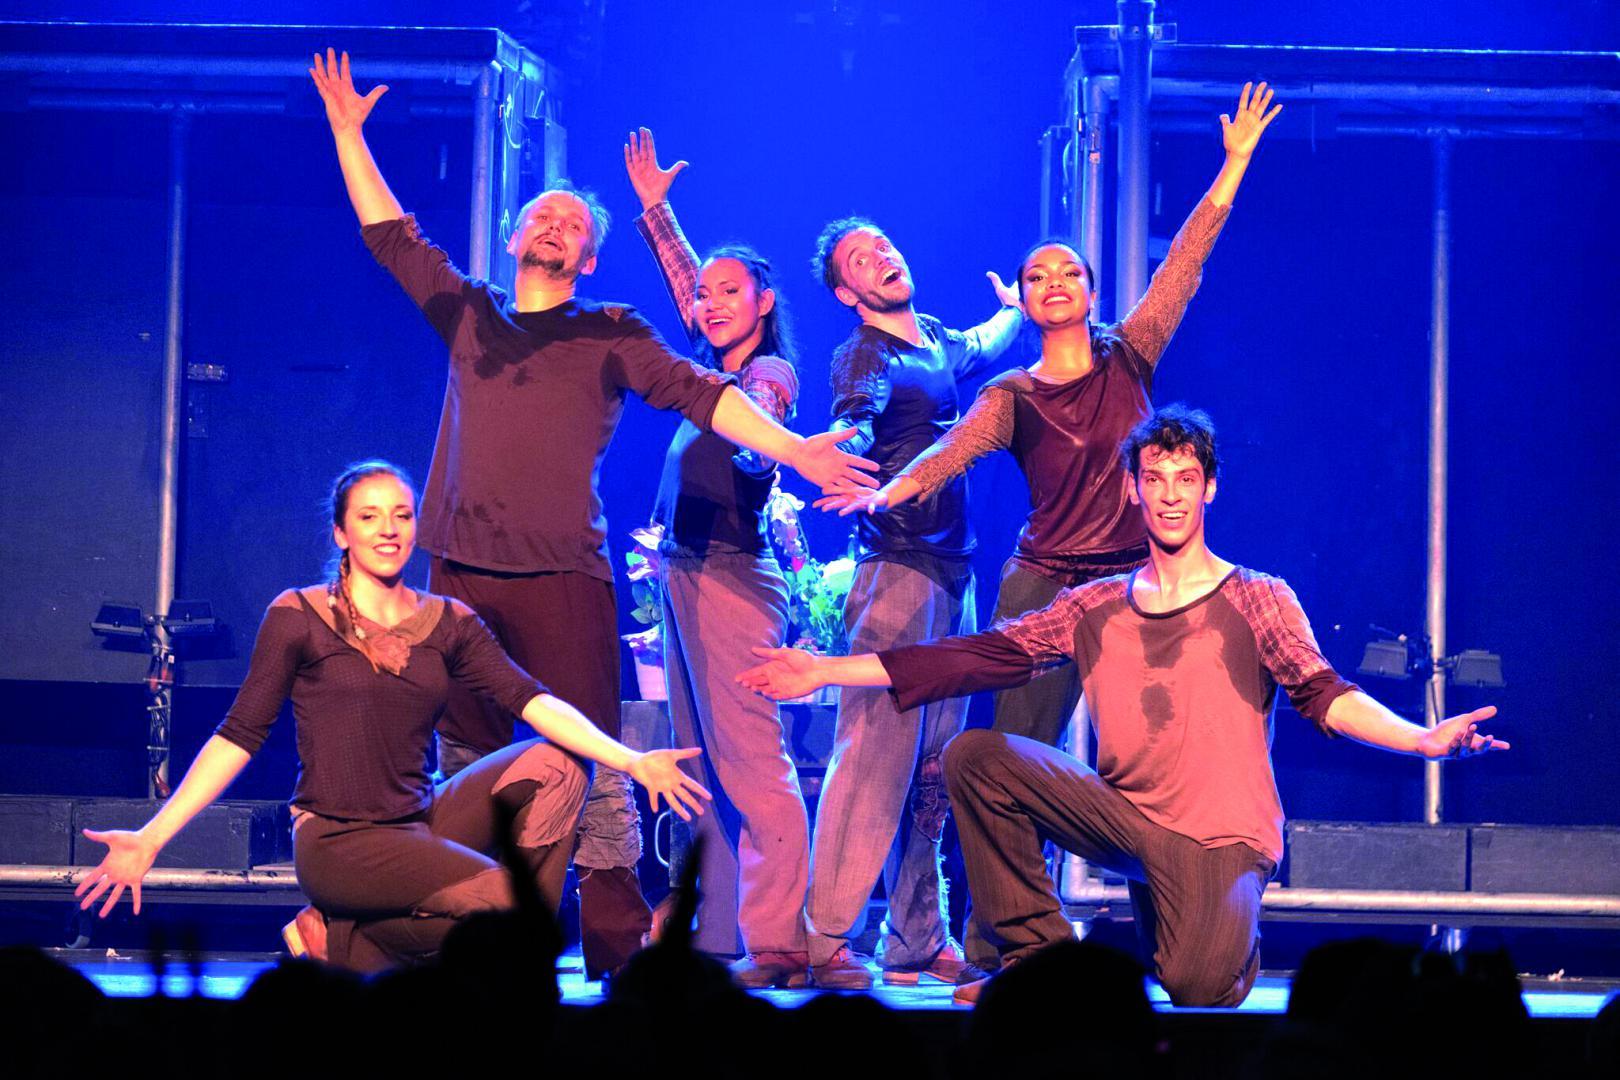 Martin's Tap Dance Company, claquettistes internationaux et